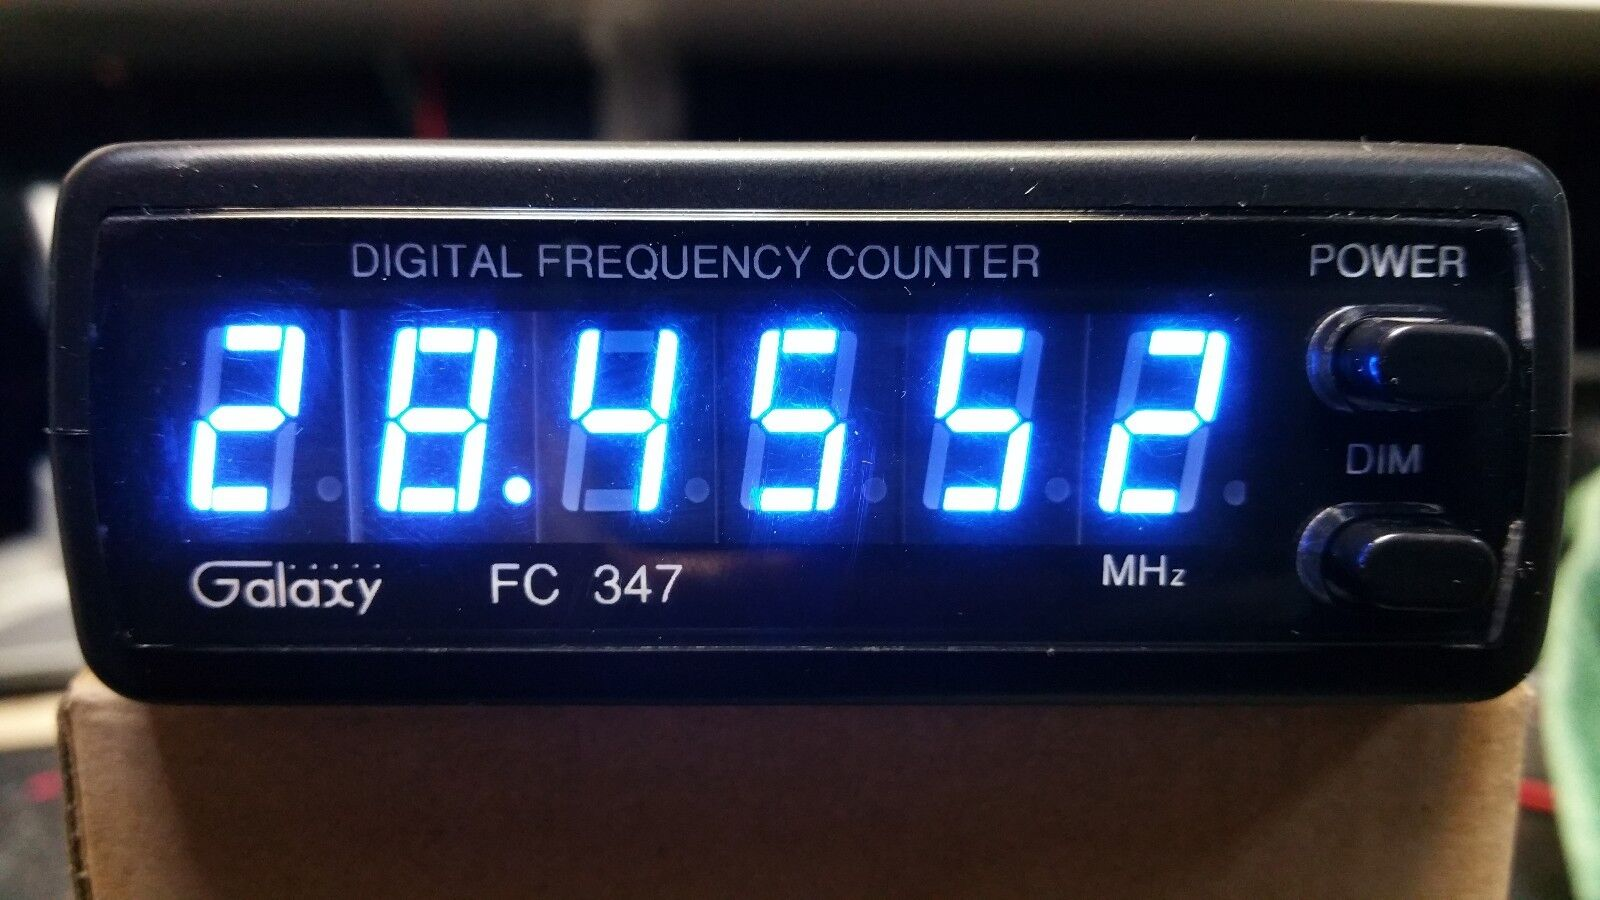 Galaxy Cb, Ham 10 Meter Radio 6 Digit Frequency Counter (...